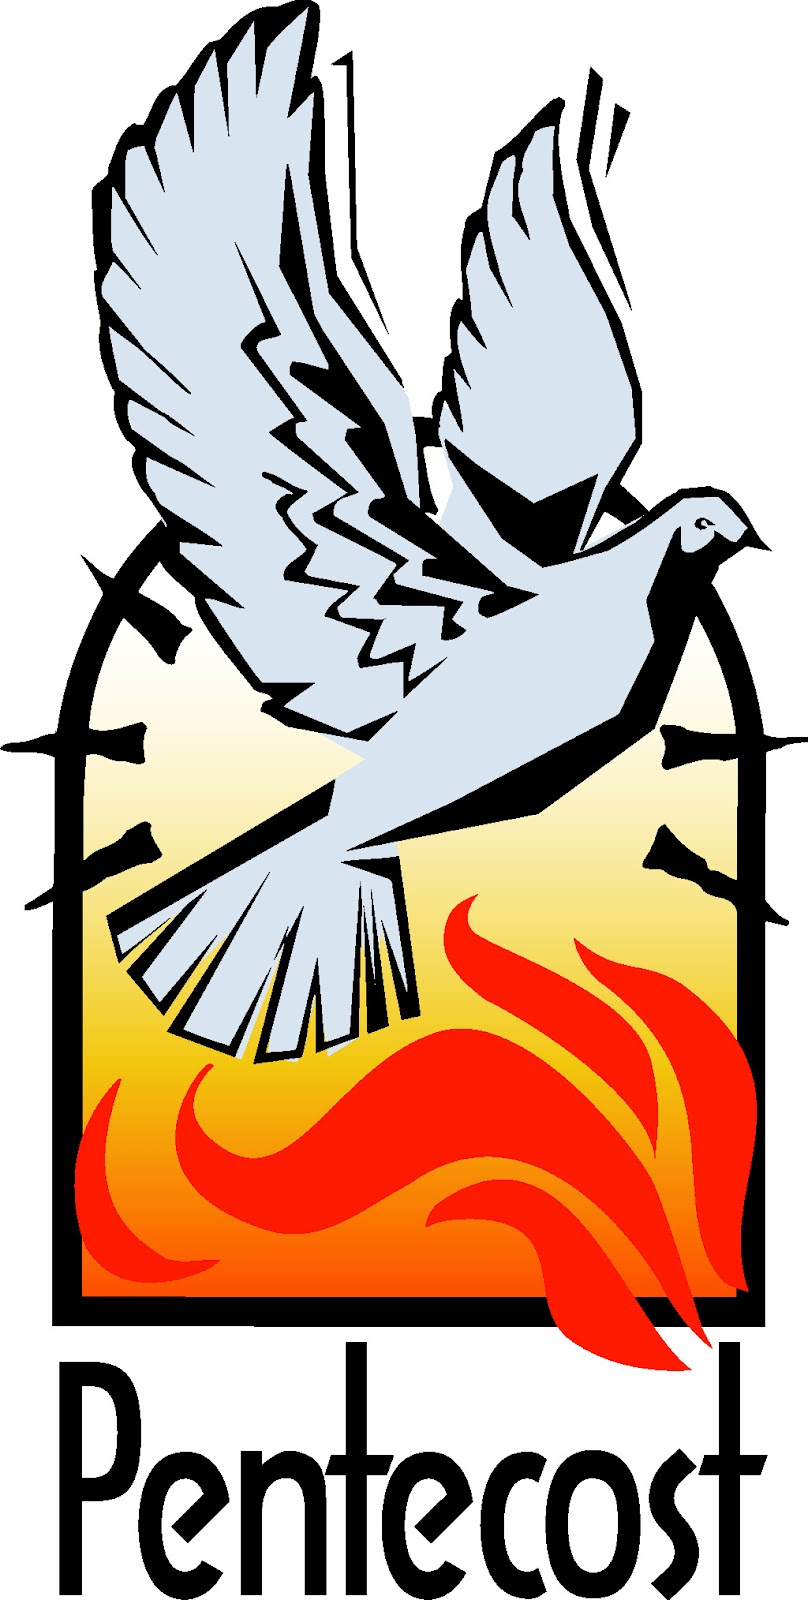 Pentecost Clip Art - Cliparts.co